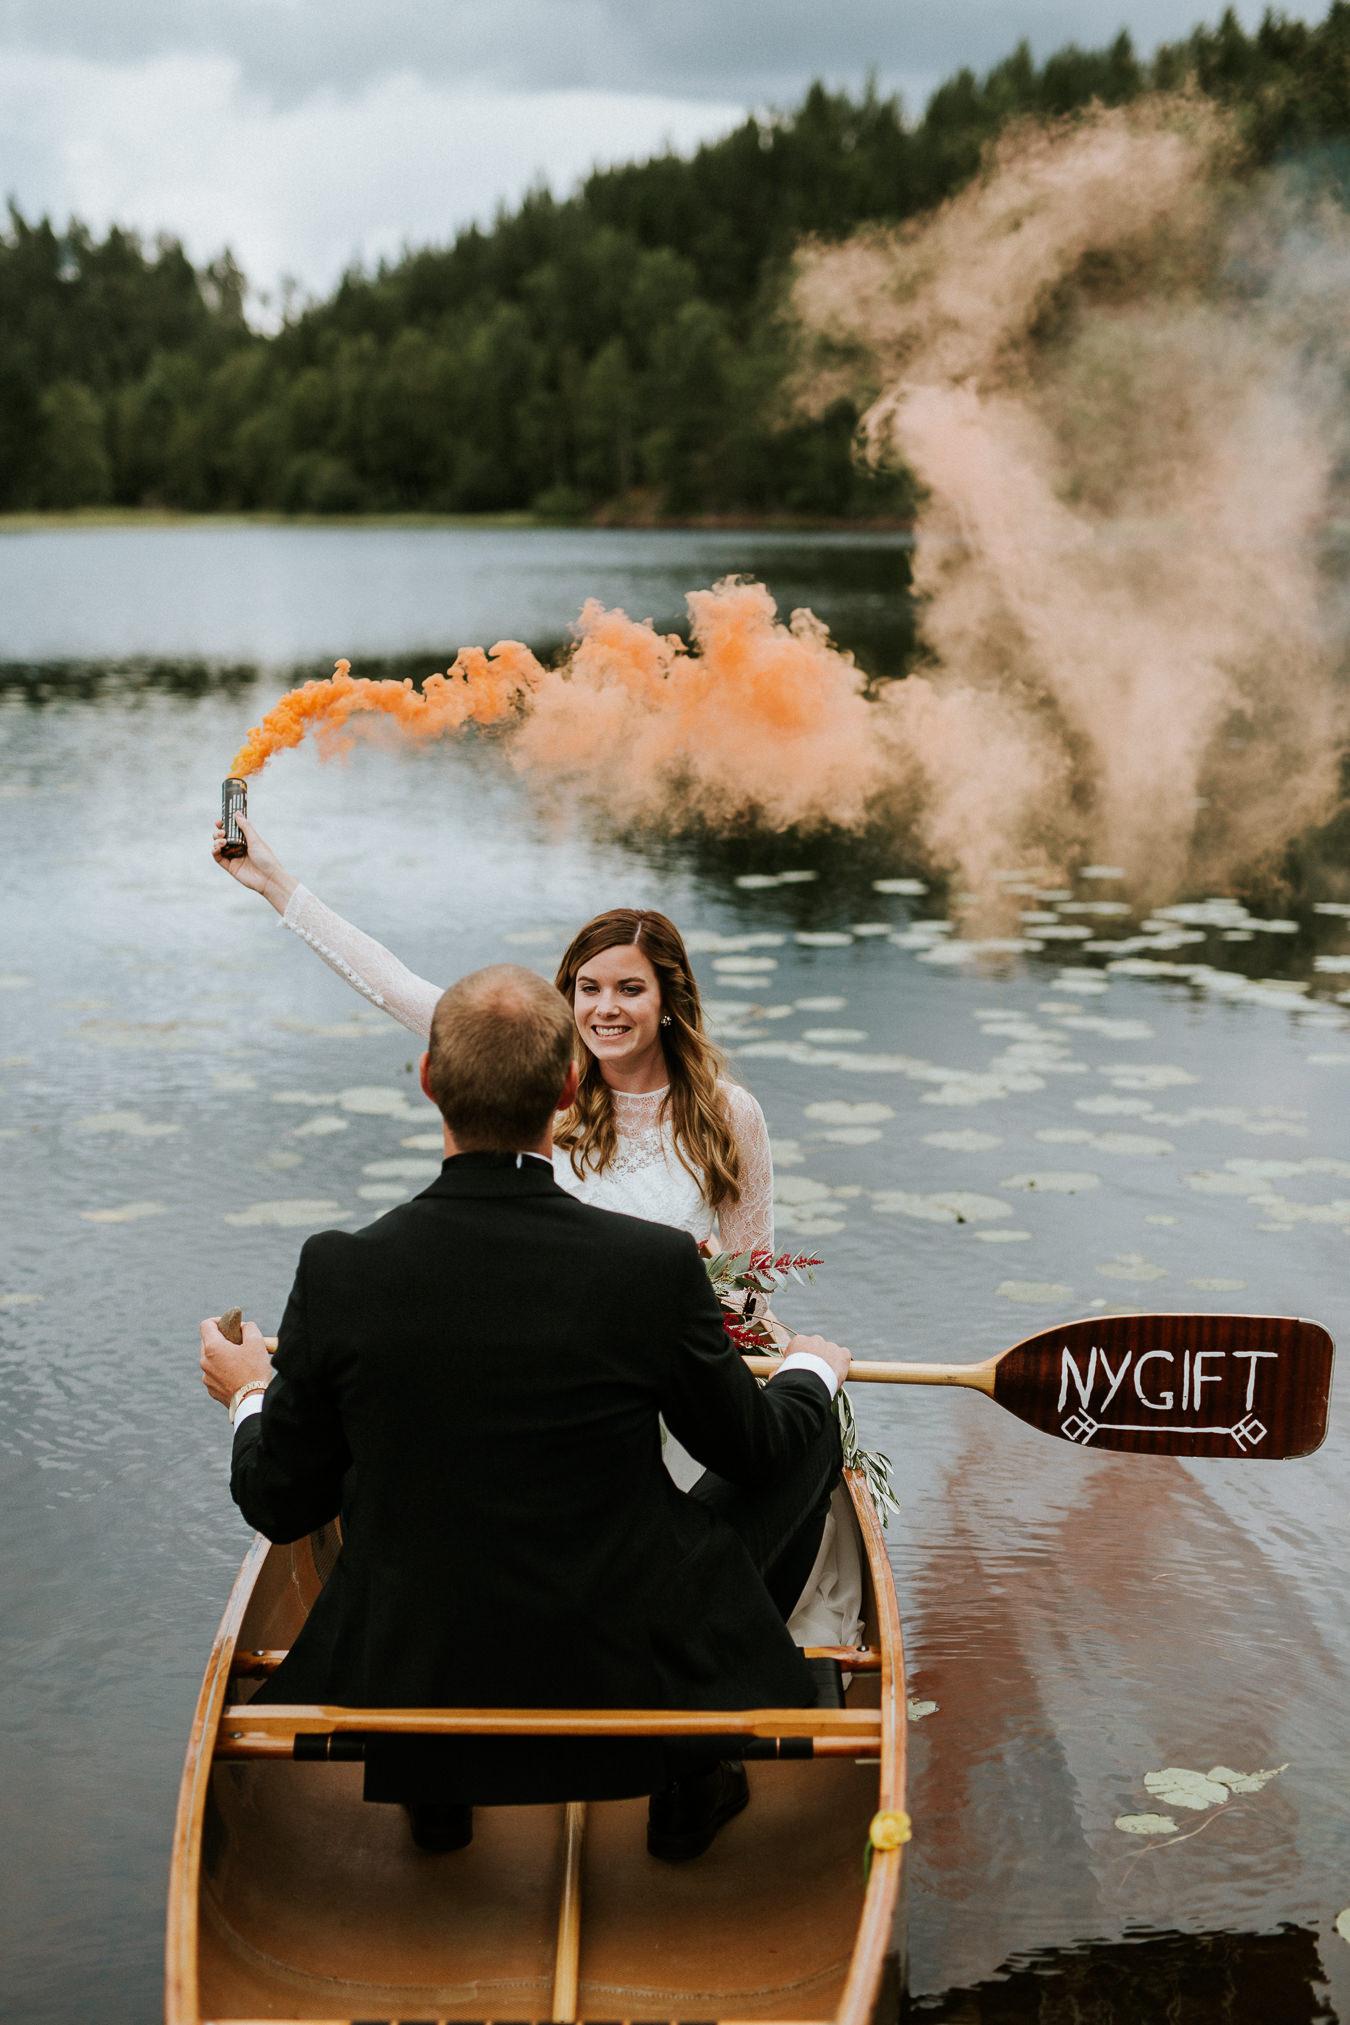 Bryllup-Lageret-Tofte-bryllupsfotograf-131.jpg